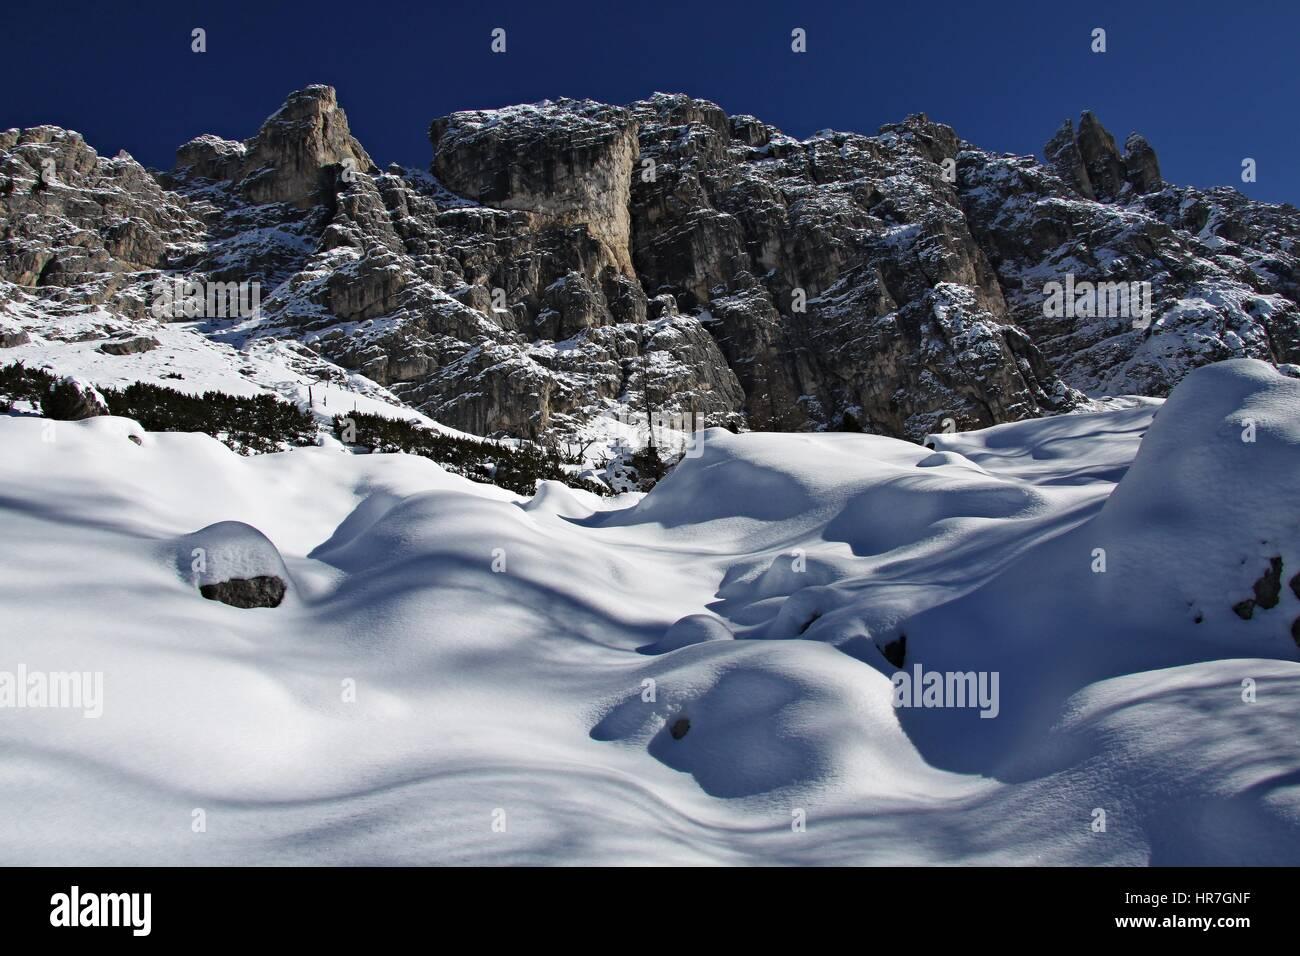 Dolomiten im Winter, Blick vom Wandern Trail Ciadin Della Neve, Italien-ID Fotografie Z Fotobanky: 585999356 Stockbild